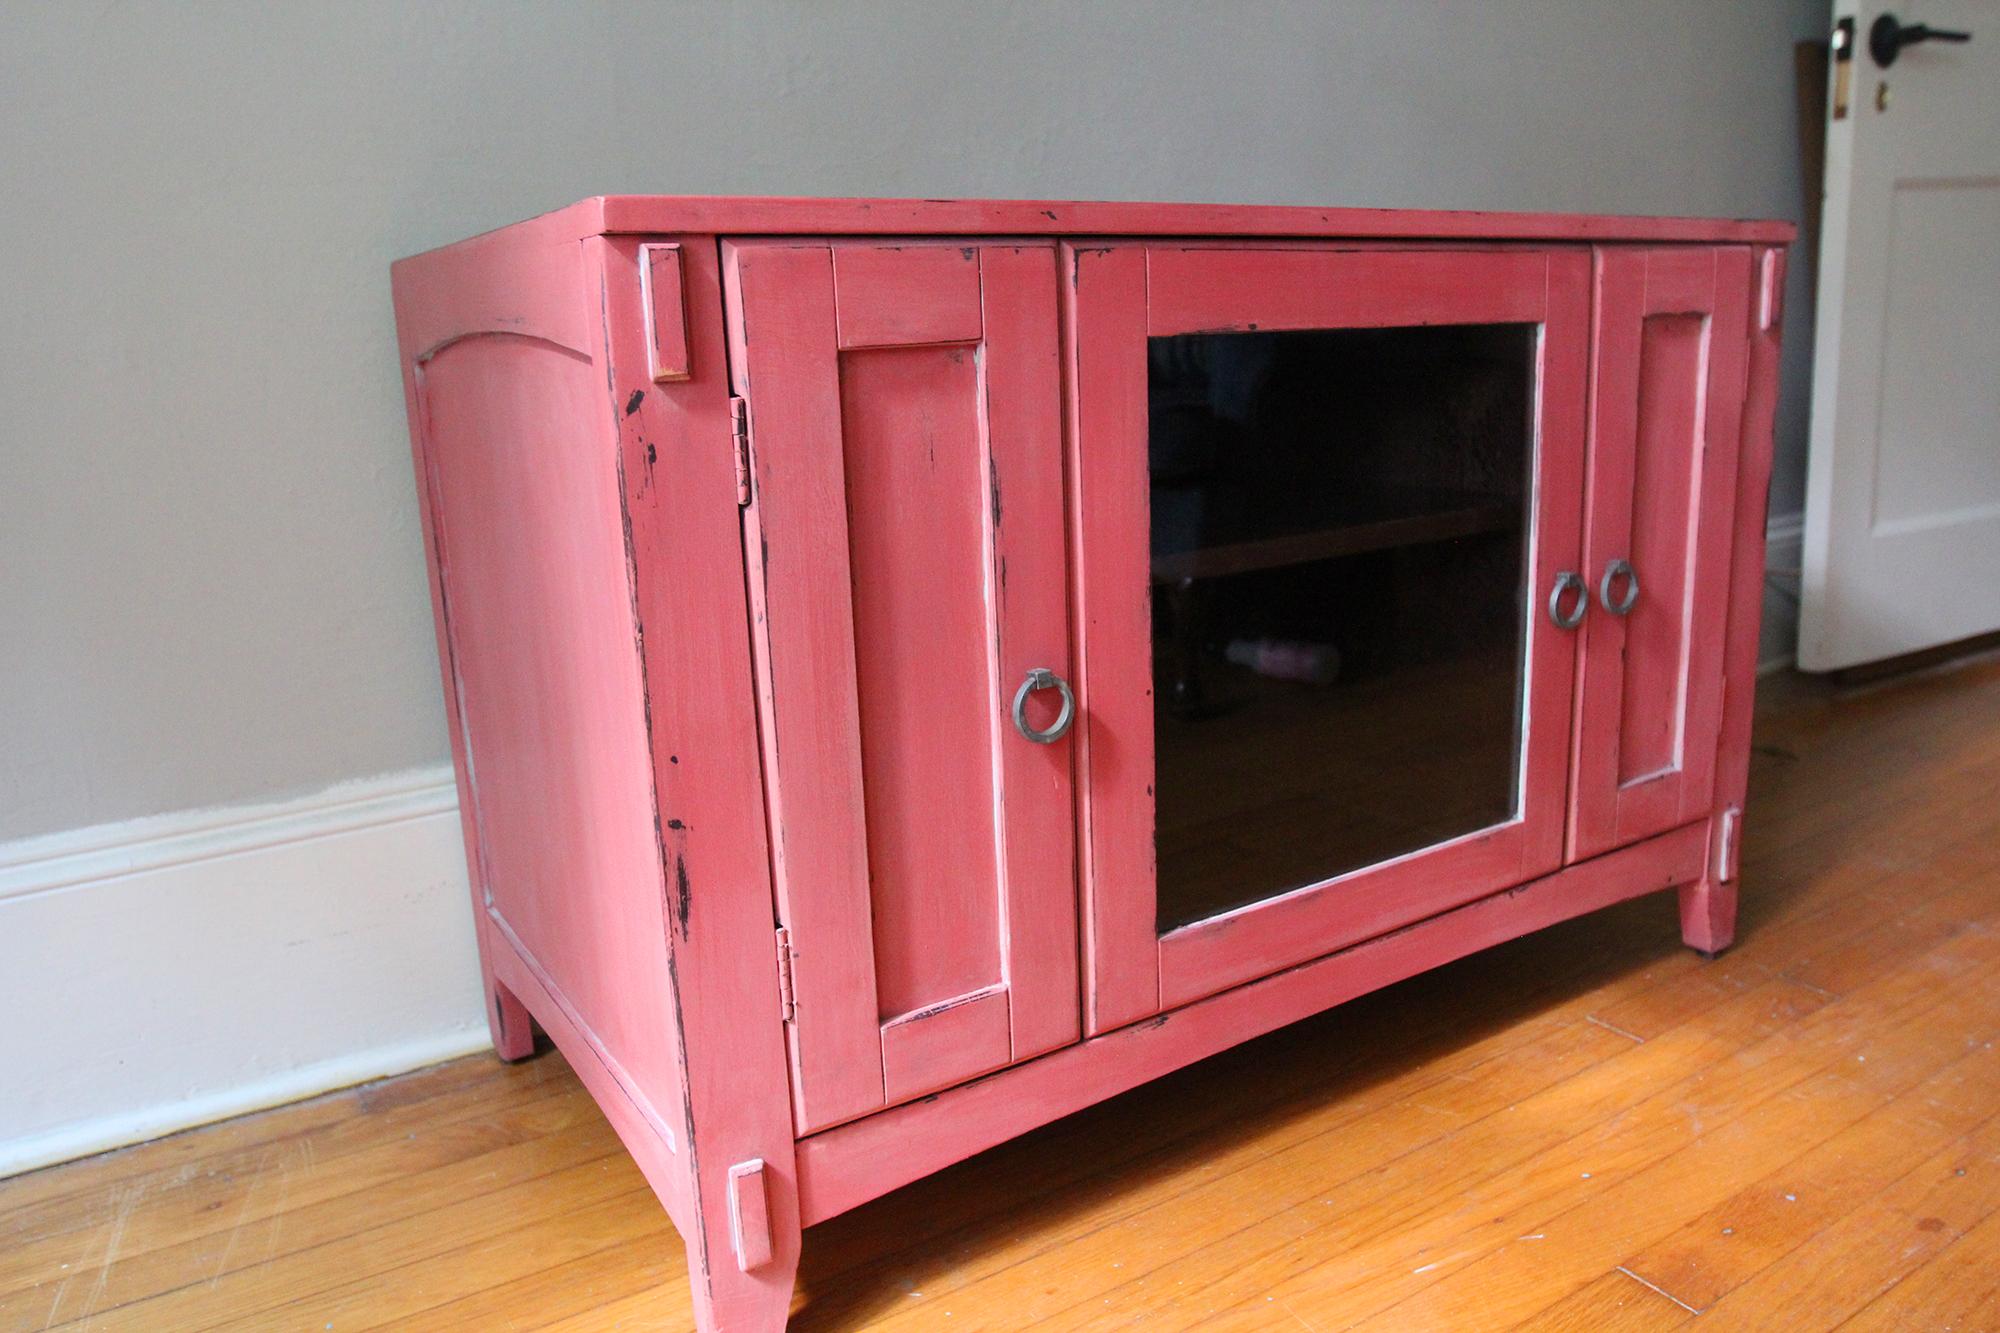 jo-torrijos-a-simpler-design-annie-sloan-chalk-paint-burgundy-arles-english-yellow-coral-atlanta-painted-furniture-7.jpg